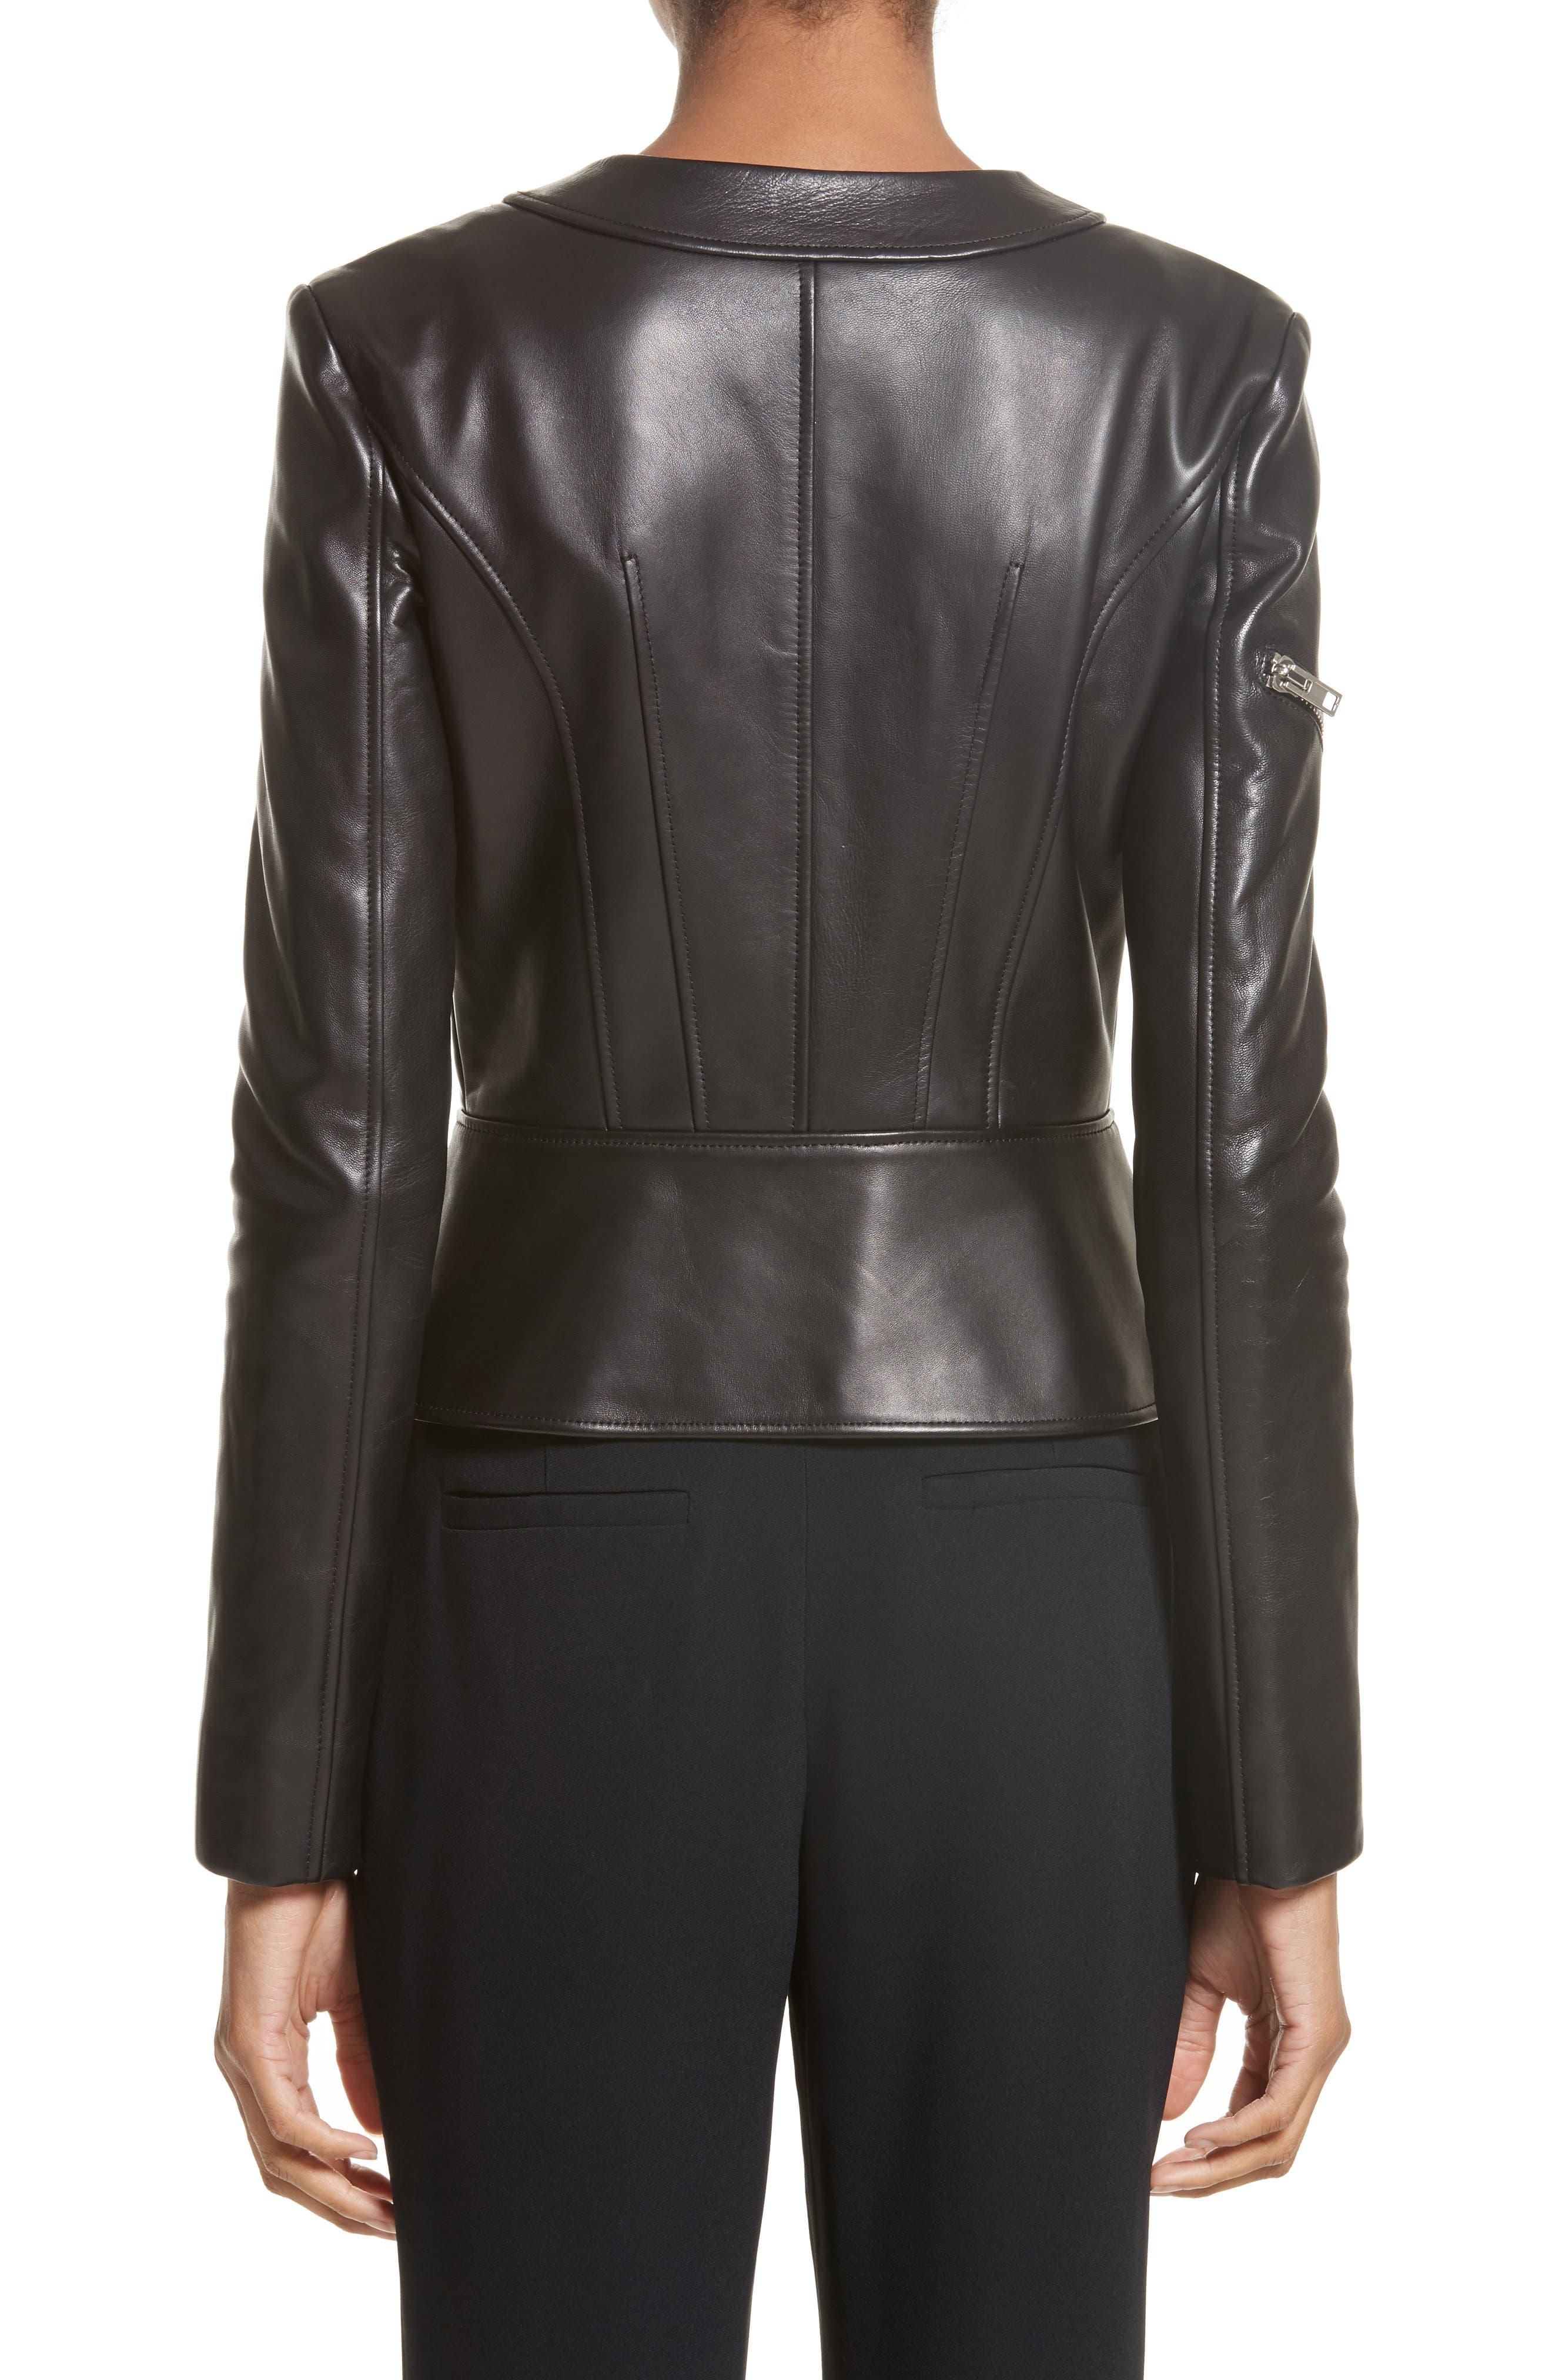 Hook Detail Lambskin Leather Jacket,                             Alternate thumbnail 2, color,                             001